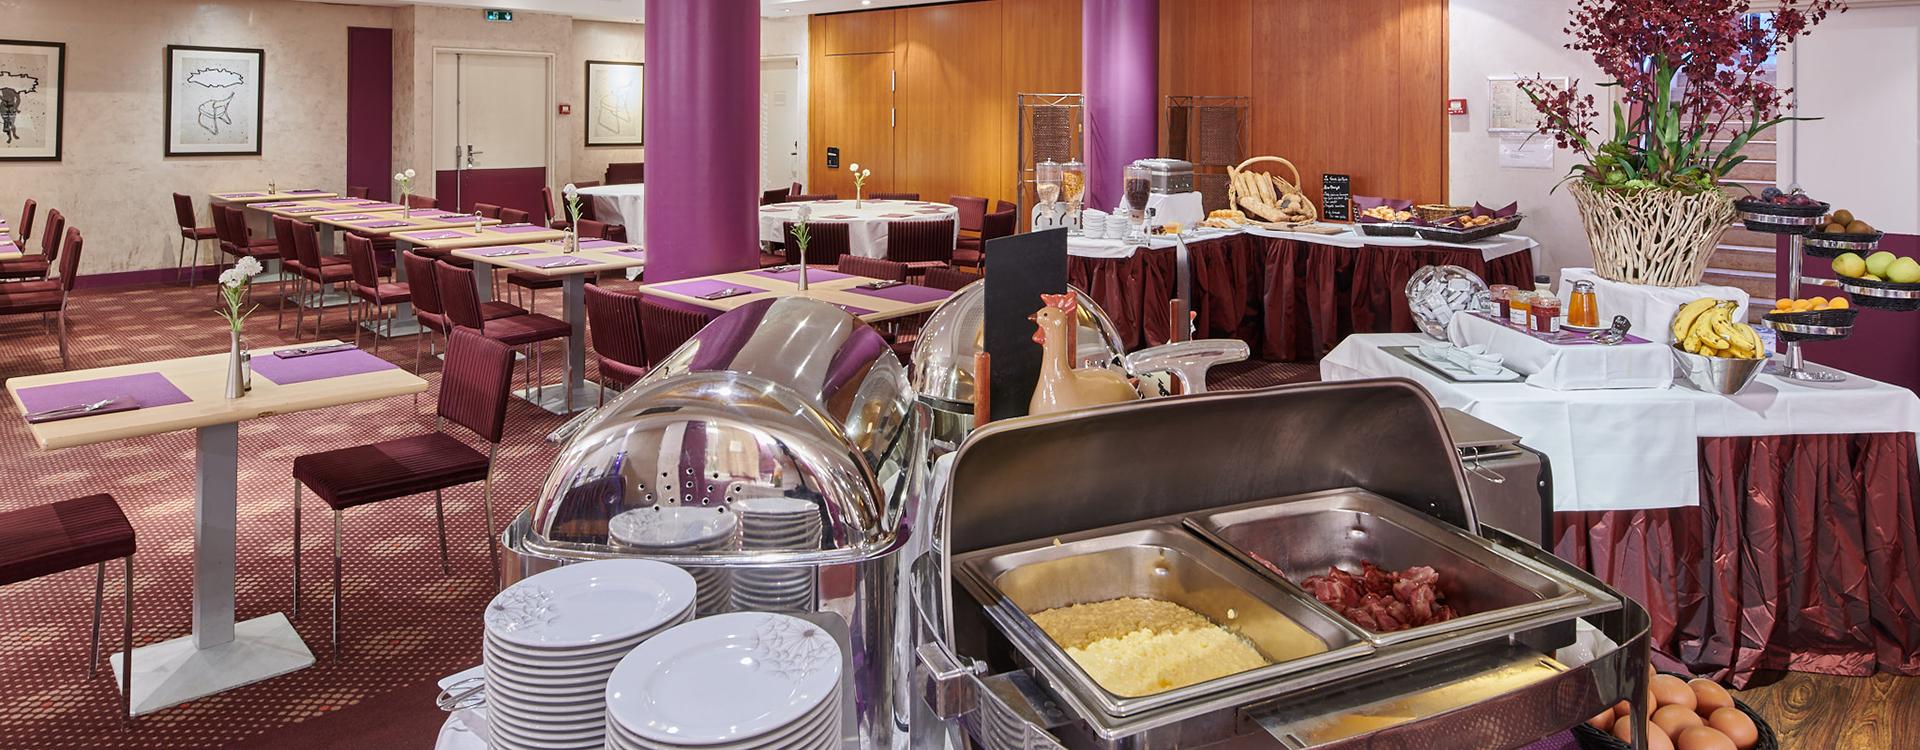 restaurant villa modigliani